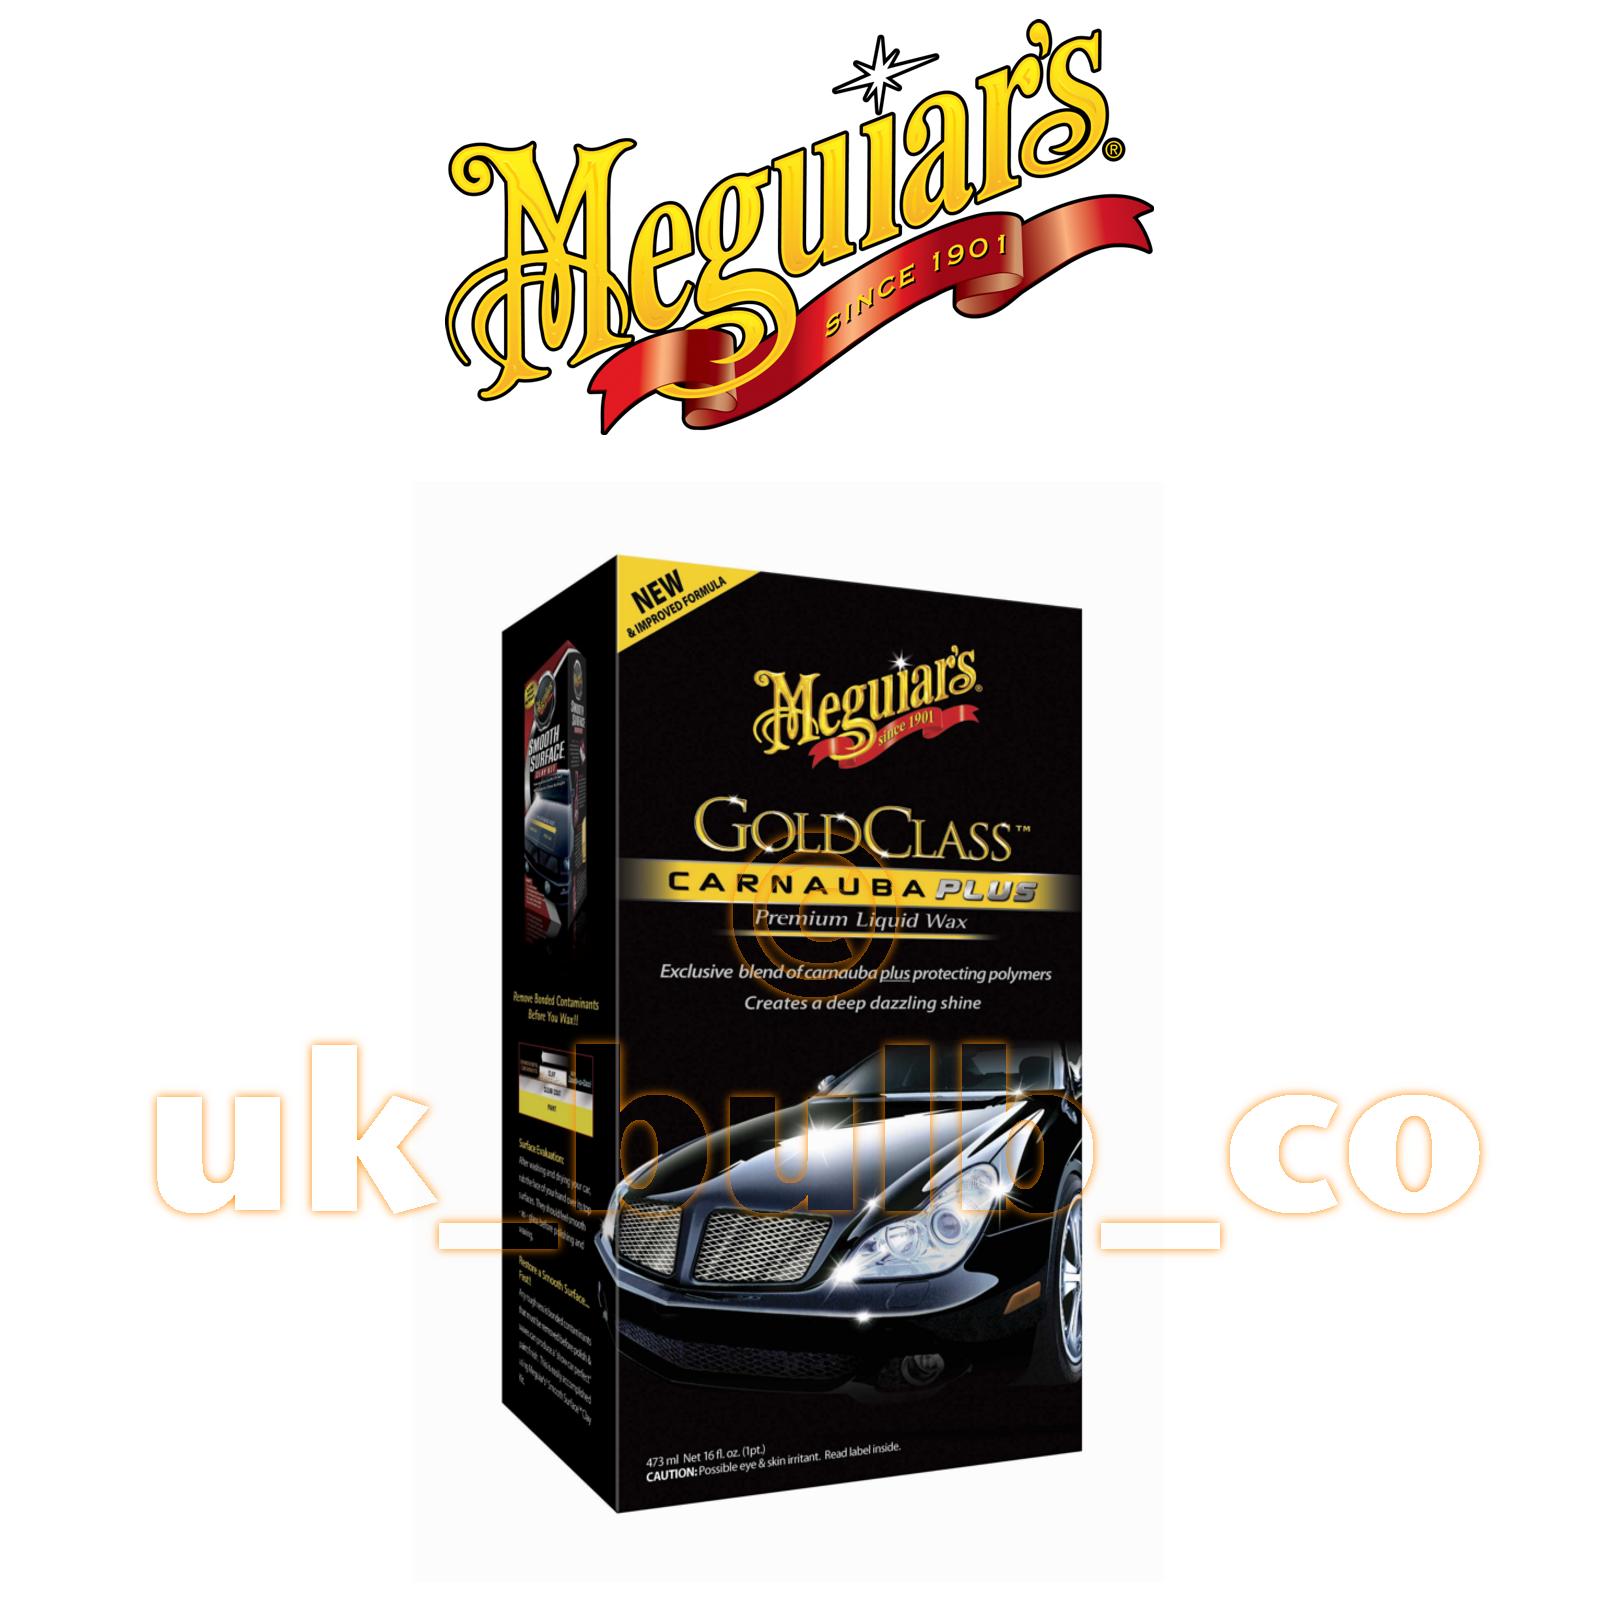 meguiars gold class wax instructions